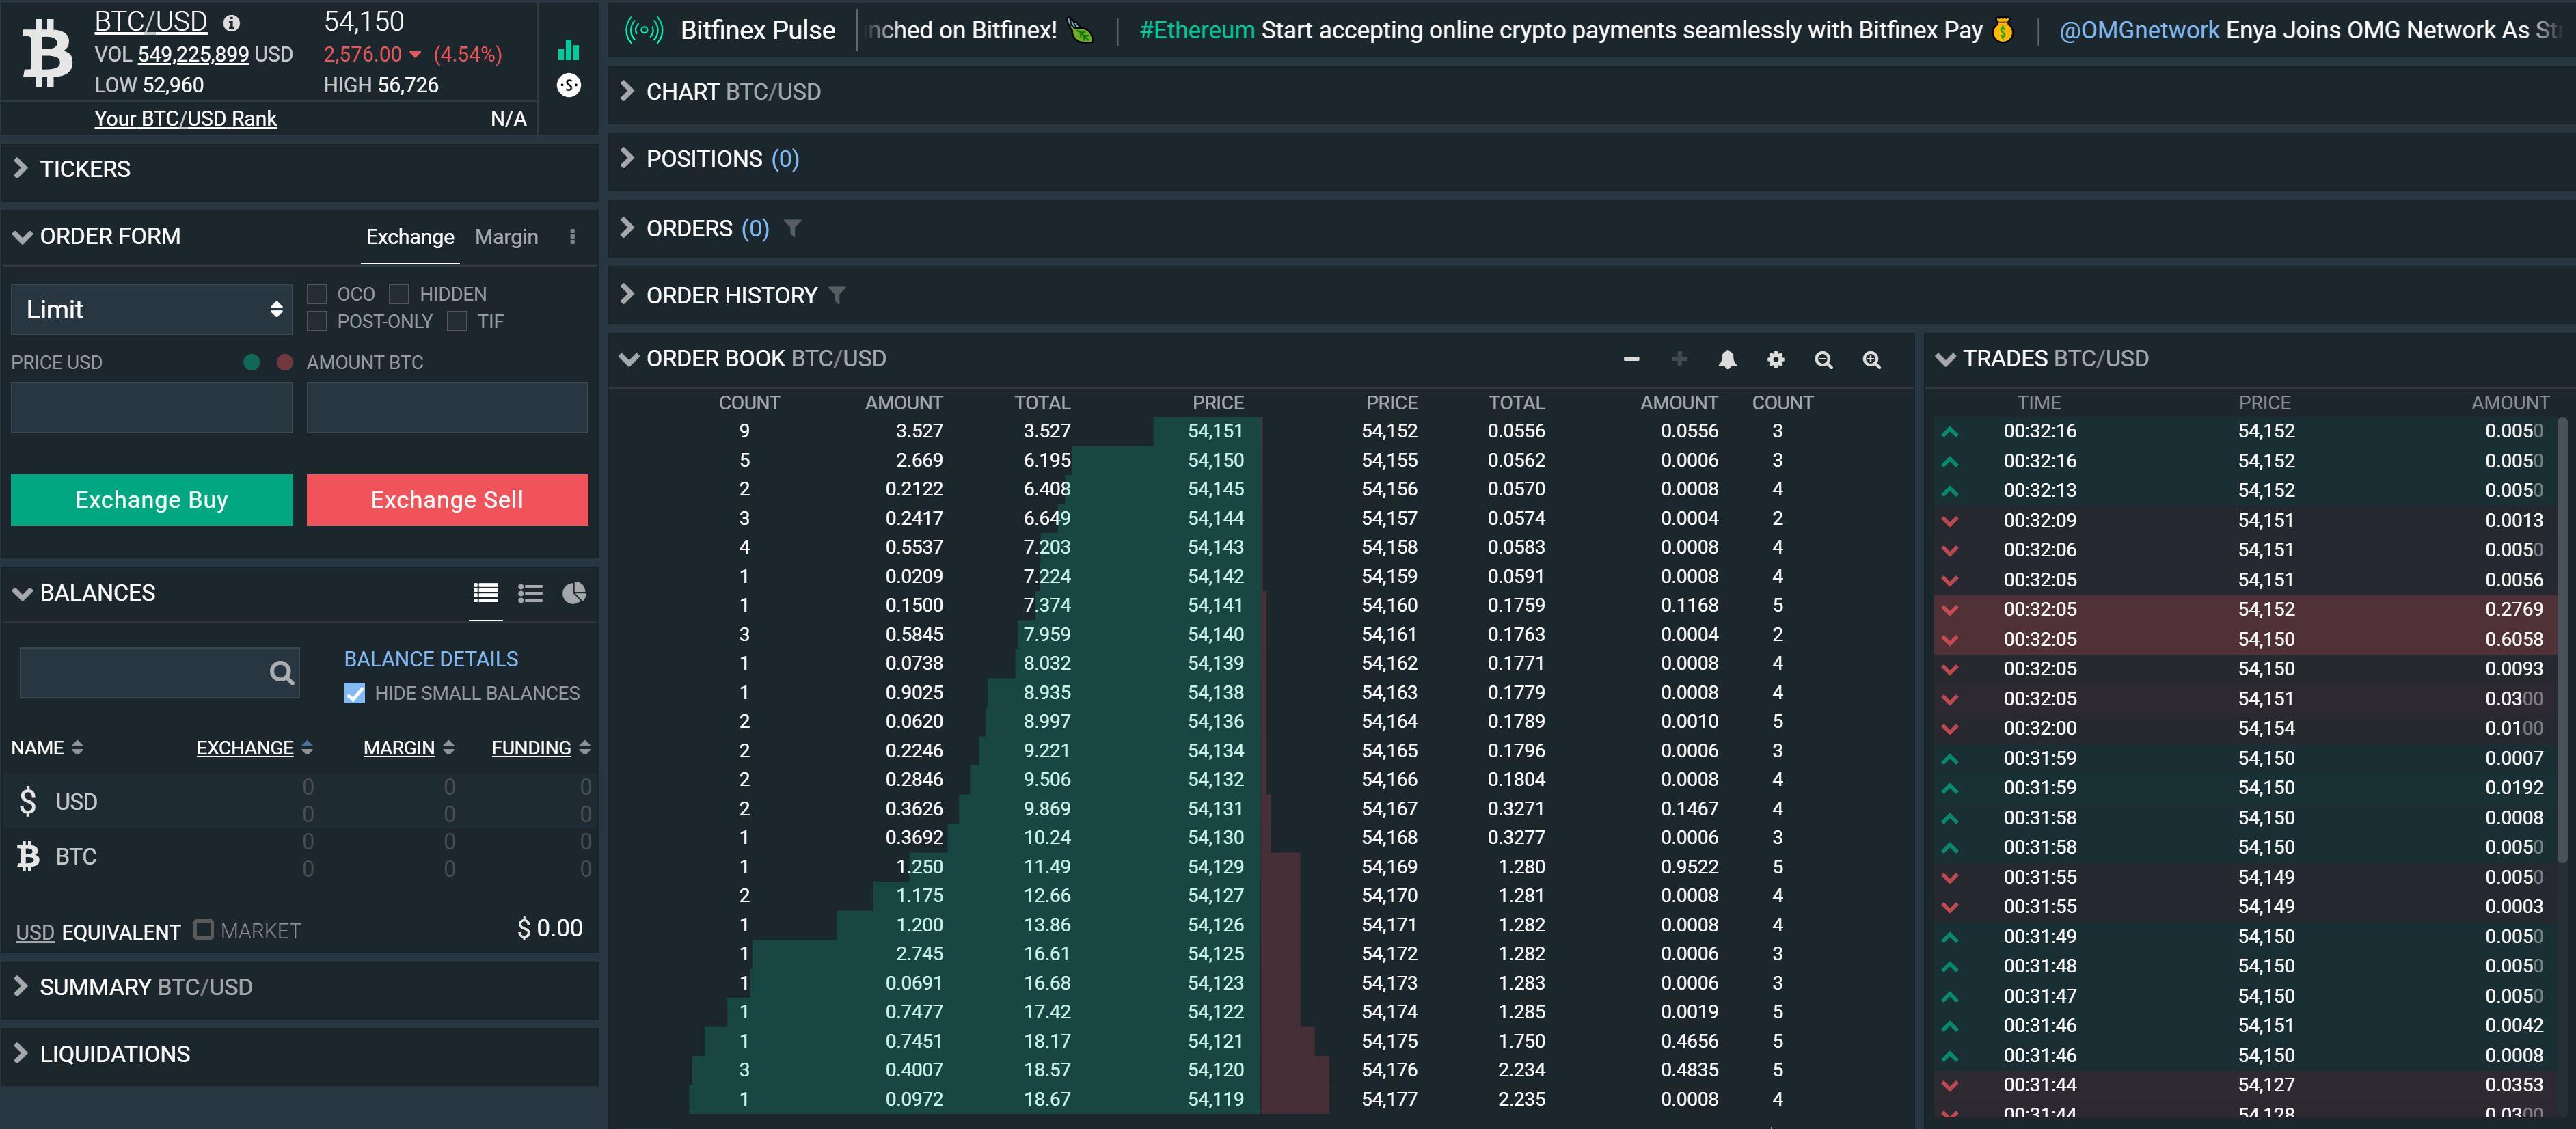 Bitfinex trading platform with custom features